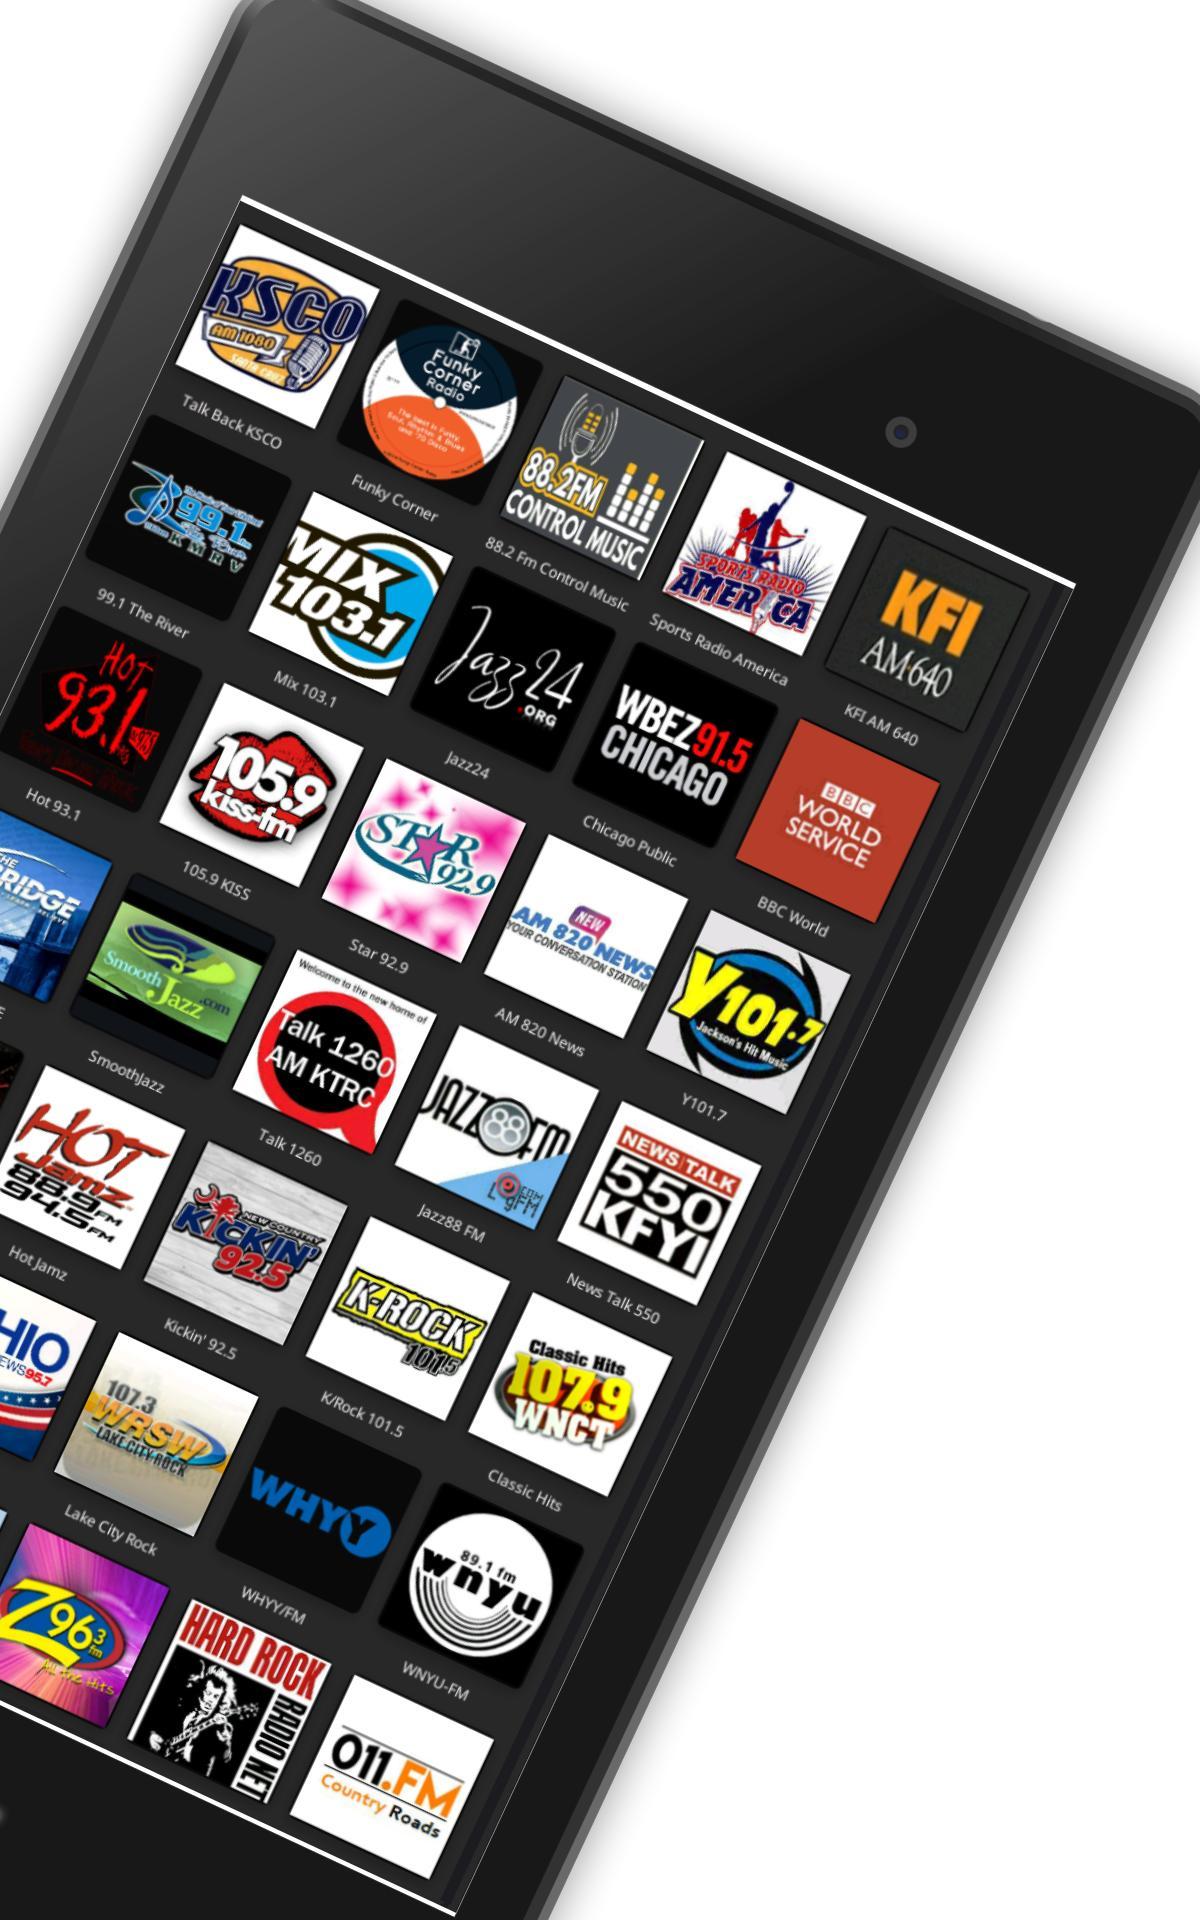 World Radio FM - All radio stations - Online Radio for